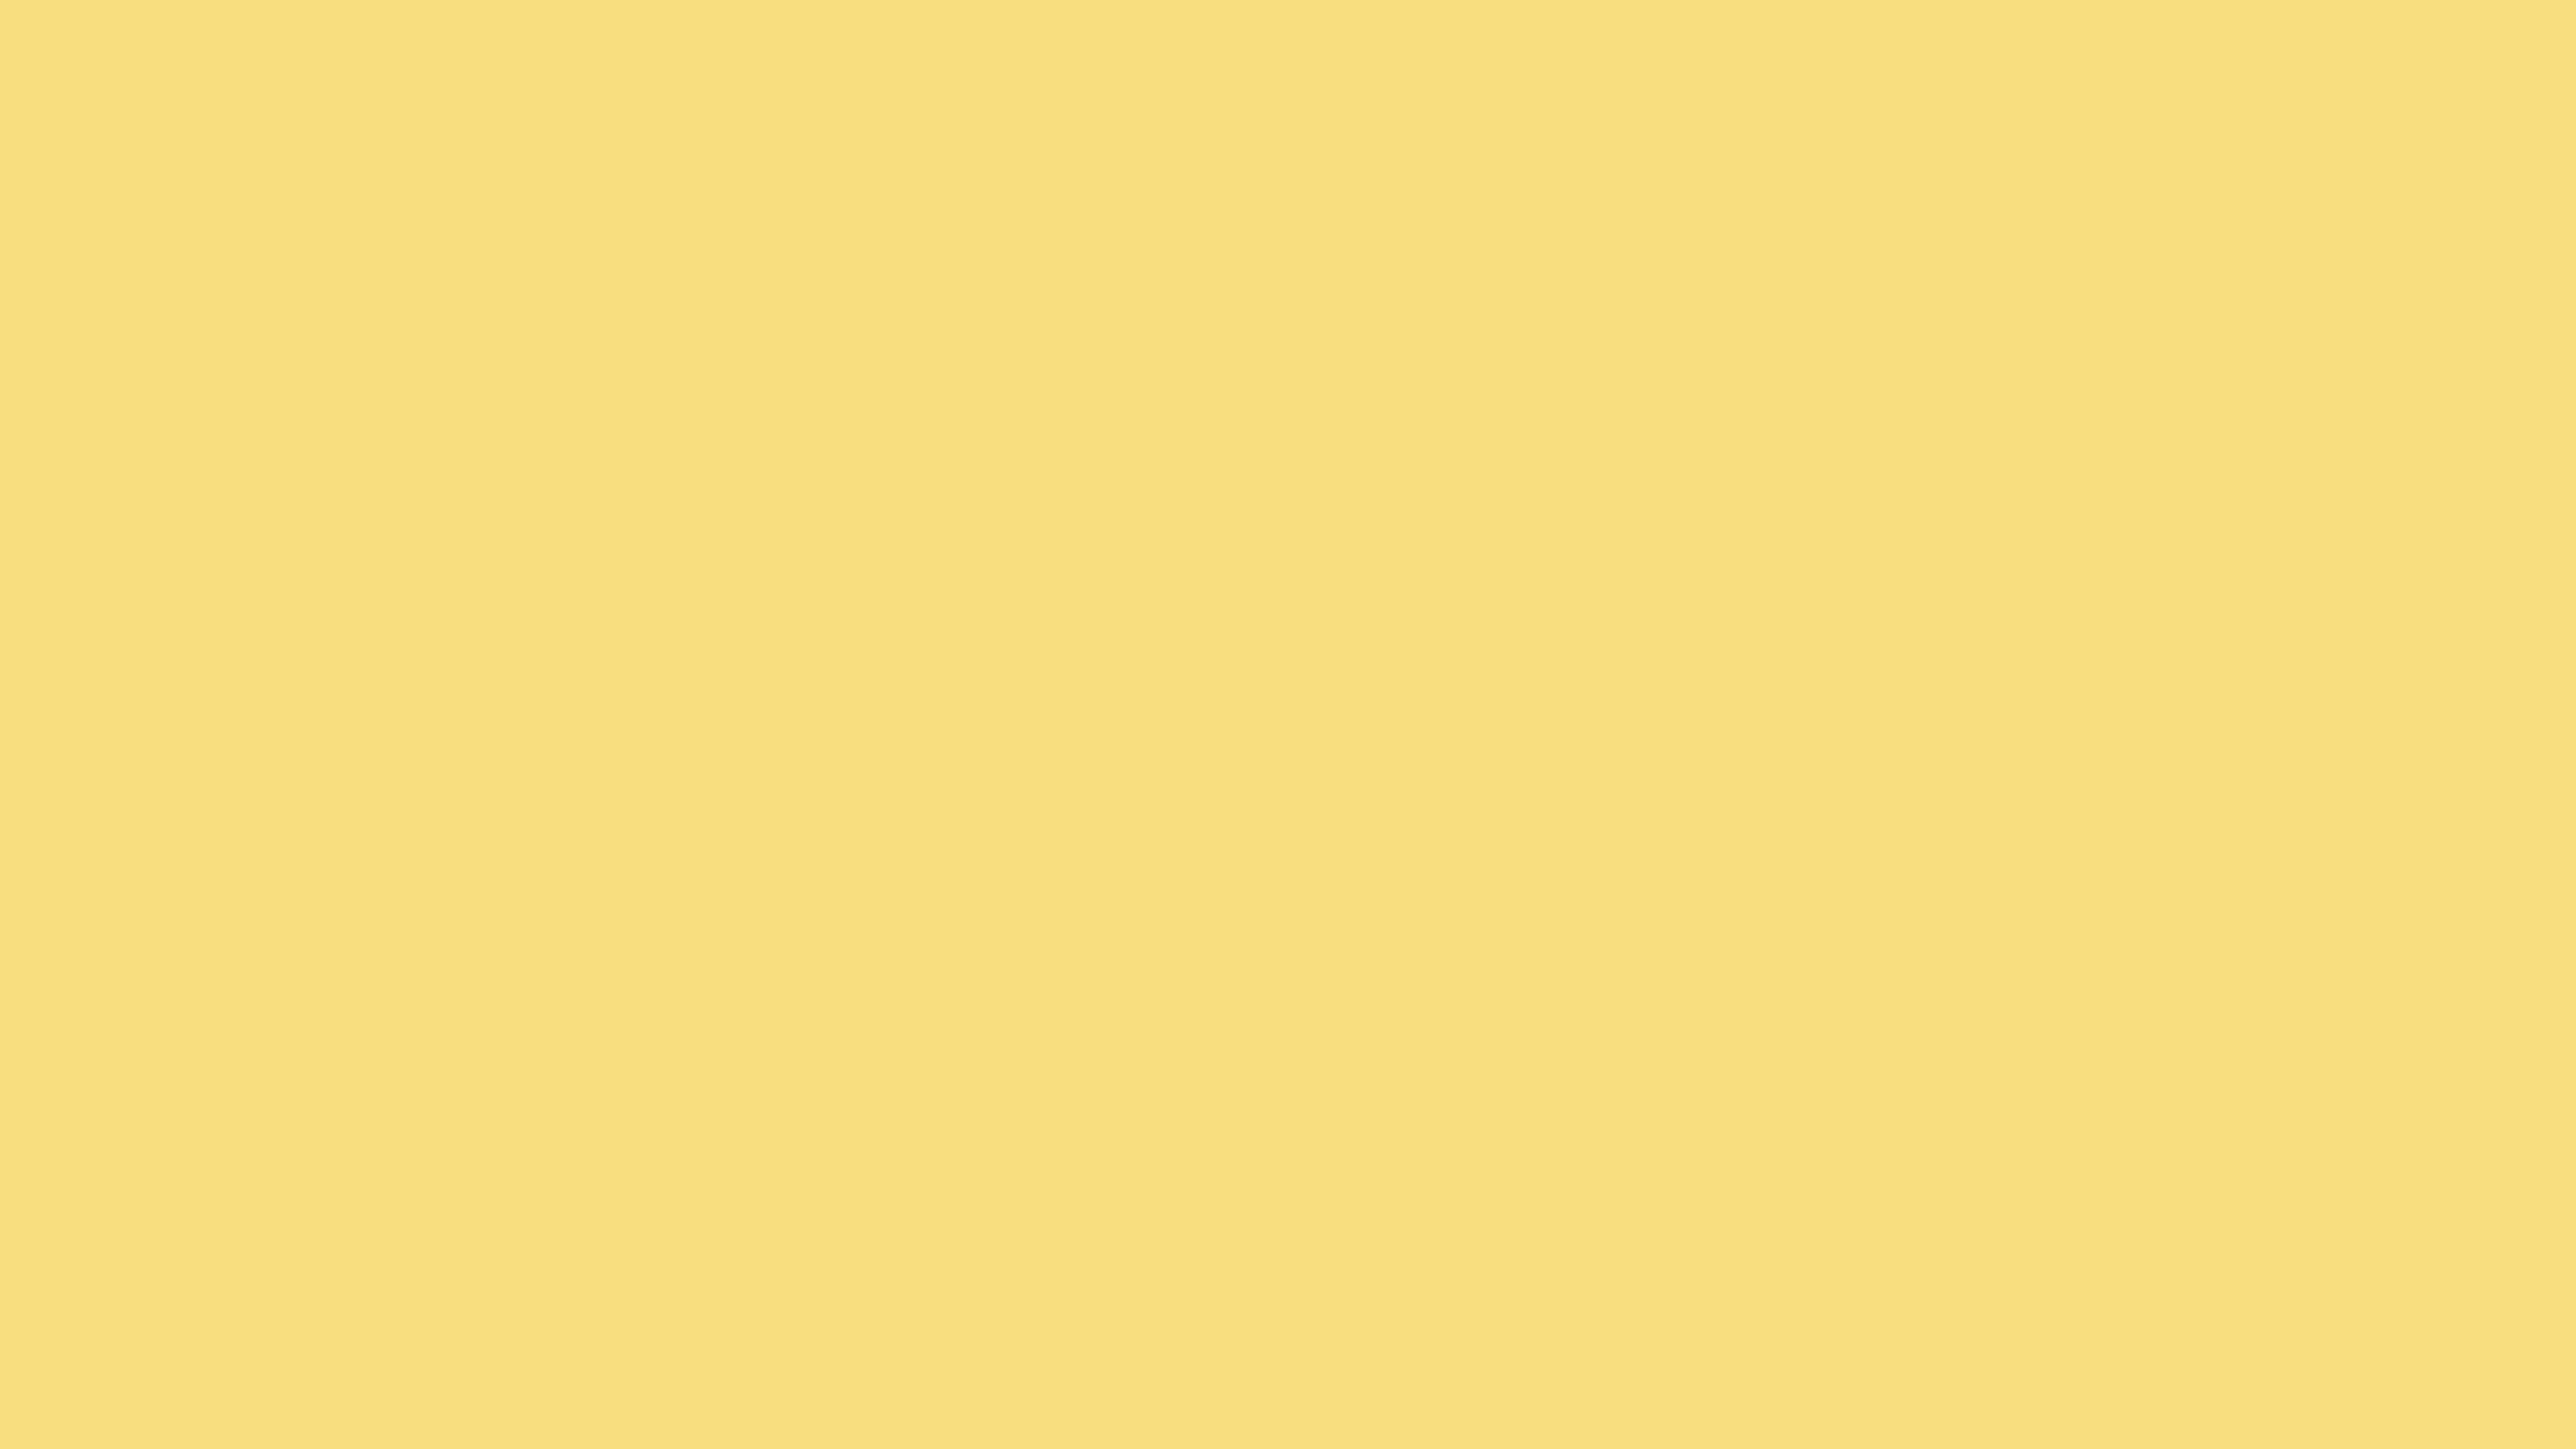 3840x2160 Jasmine Solid Color Background